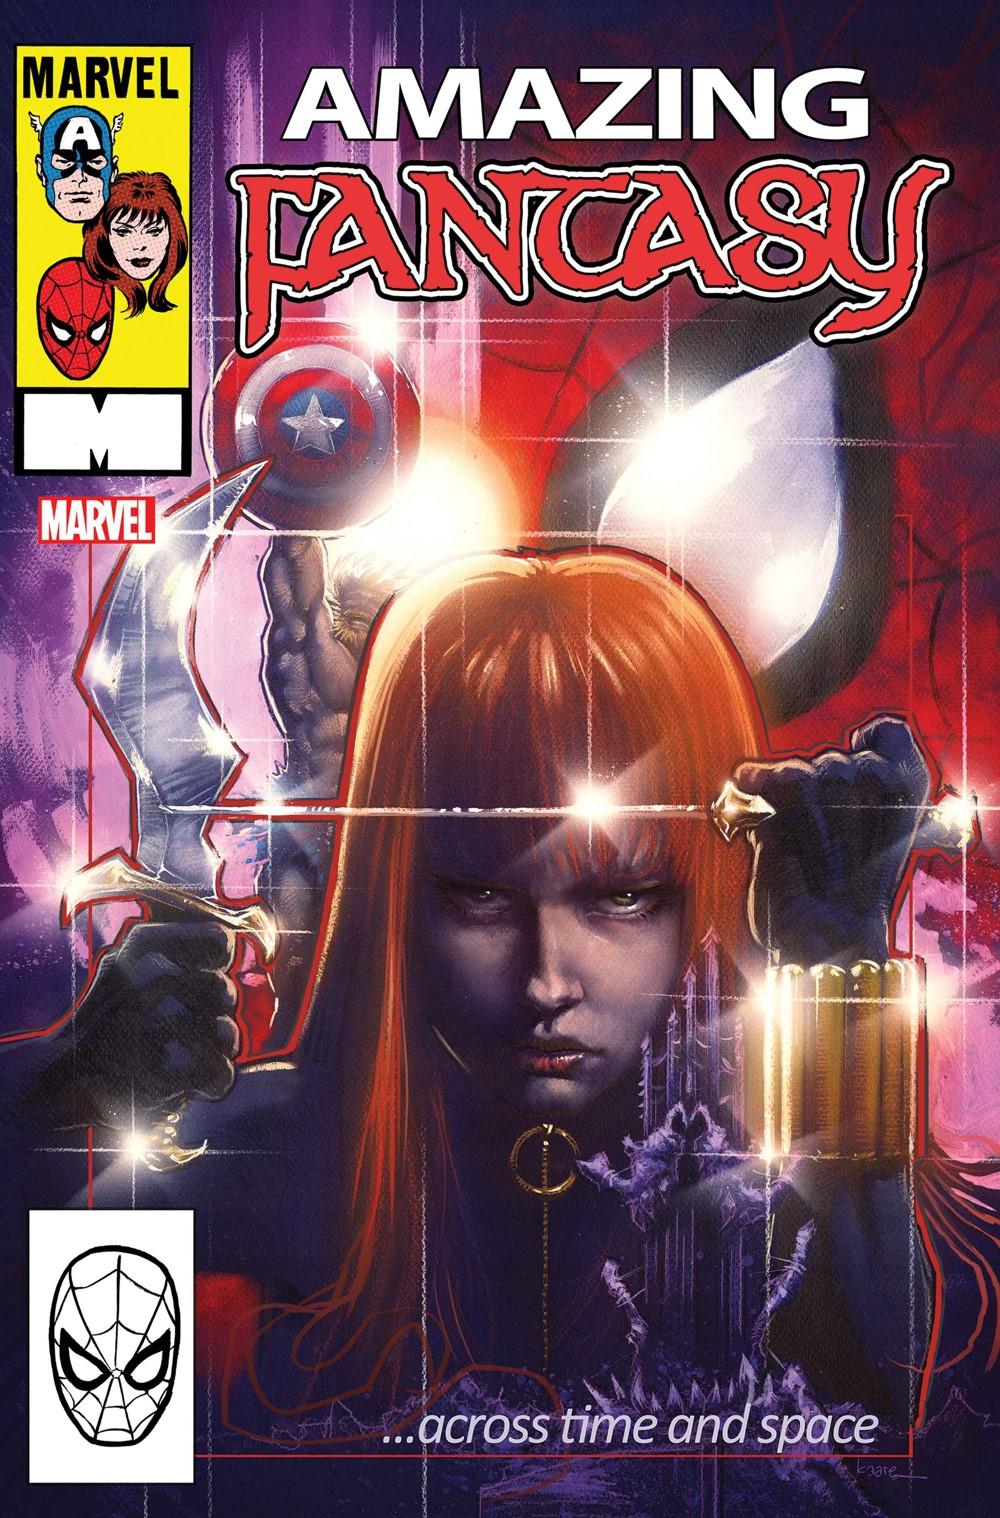 AMFAN2021003_Andrews_Var Marvel Comics September 2021 Solicitations